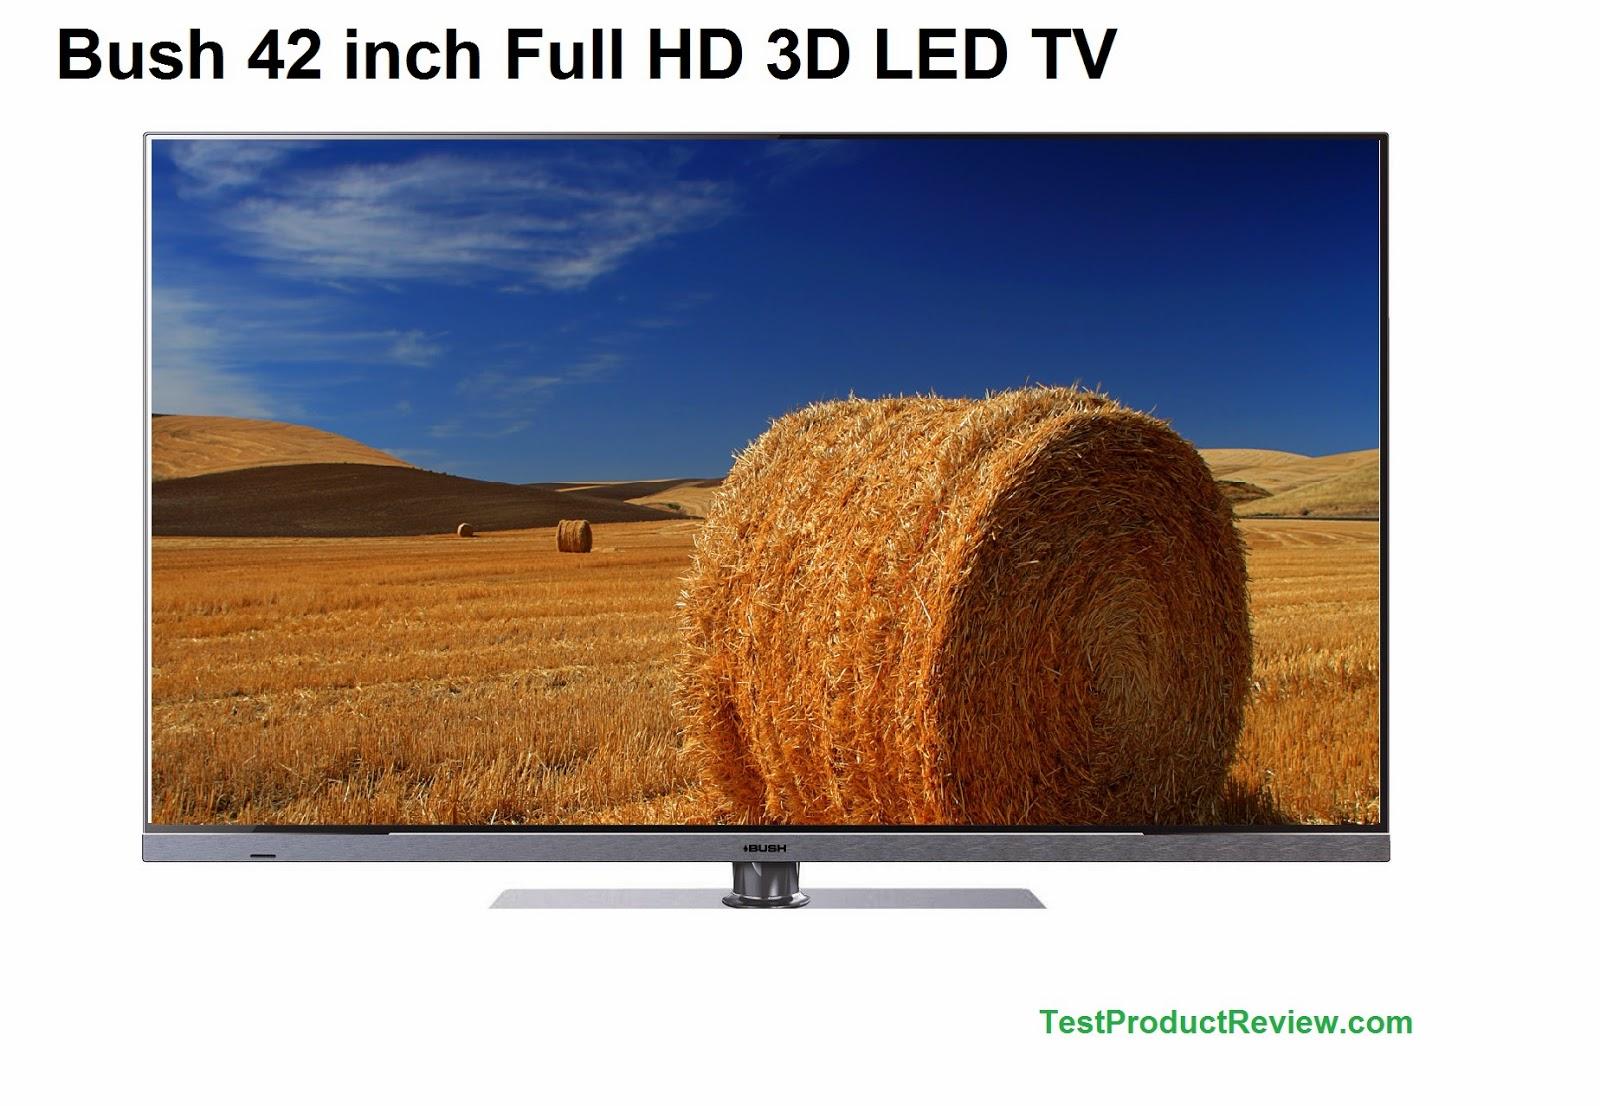 42 inch Full HD 3D LED Bush TV